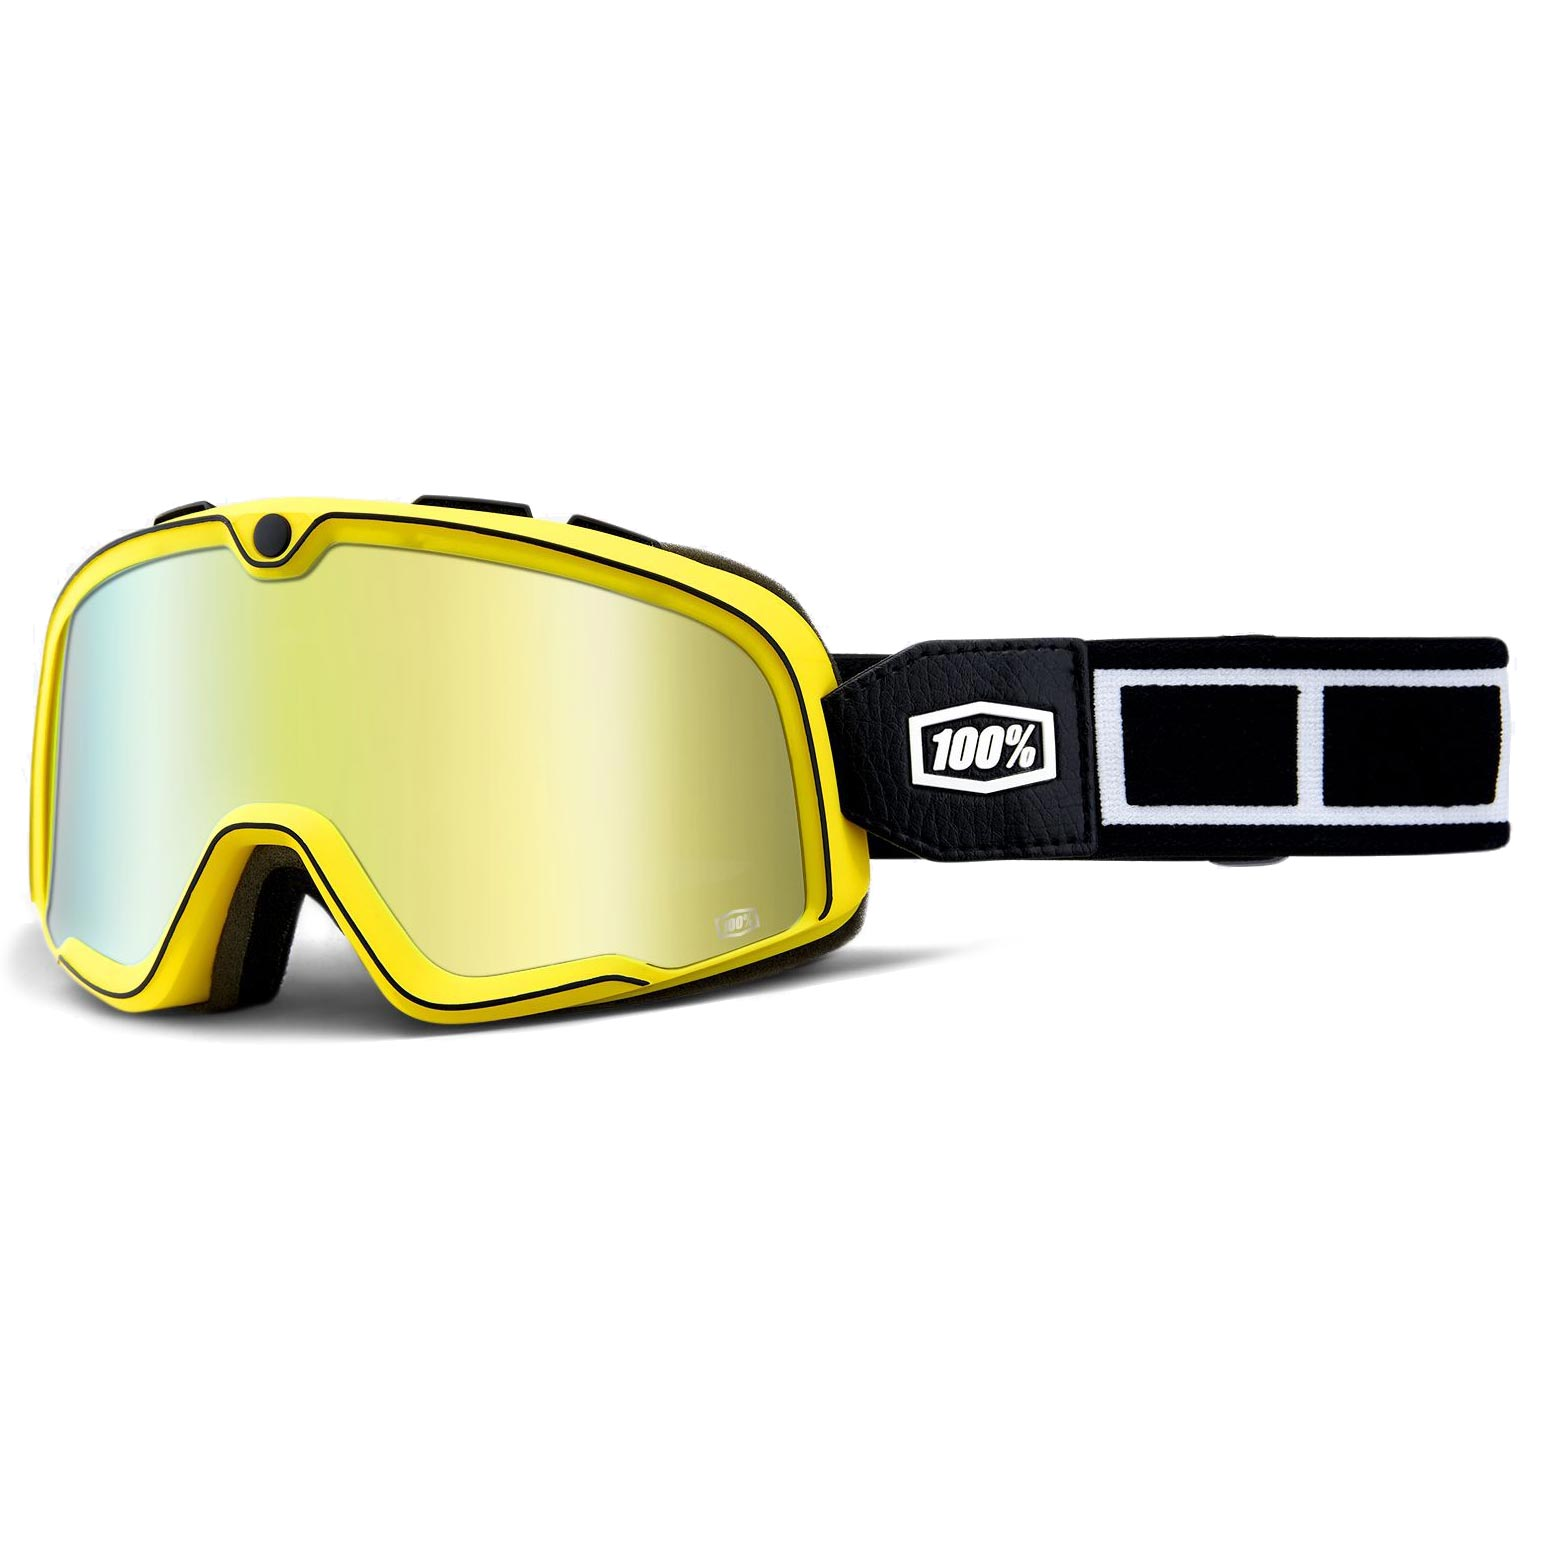 c9b490e48e136d masque moto 100 barstow burnworth mirror gold lens scrambler jaune noir